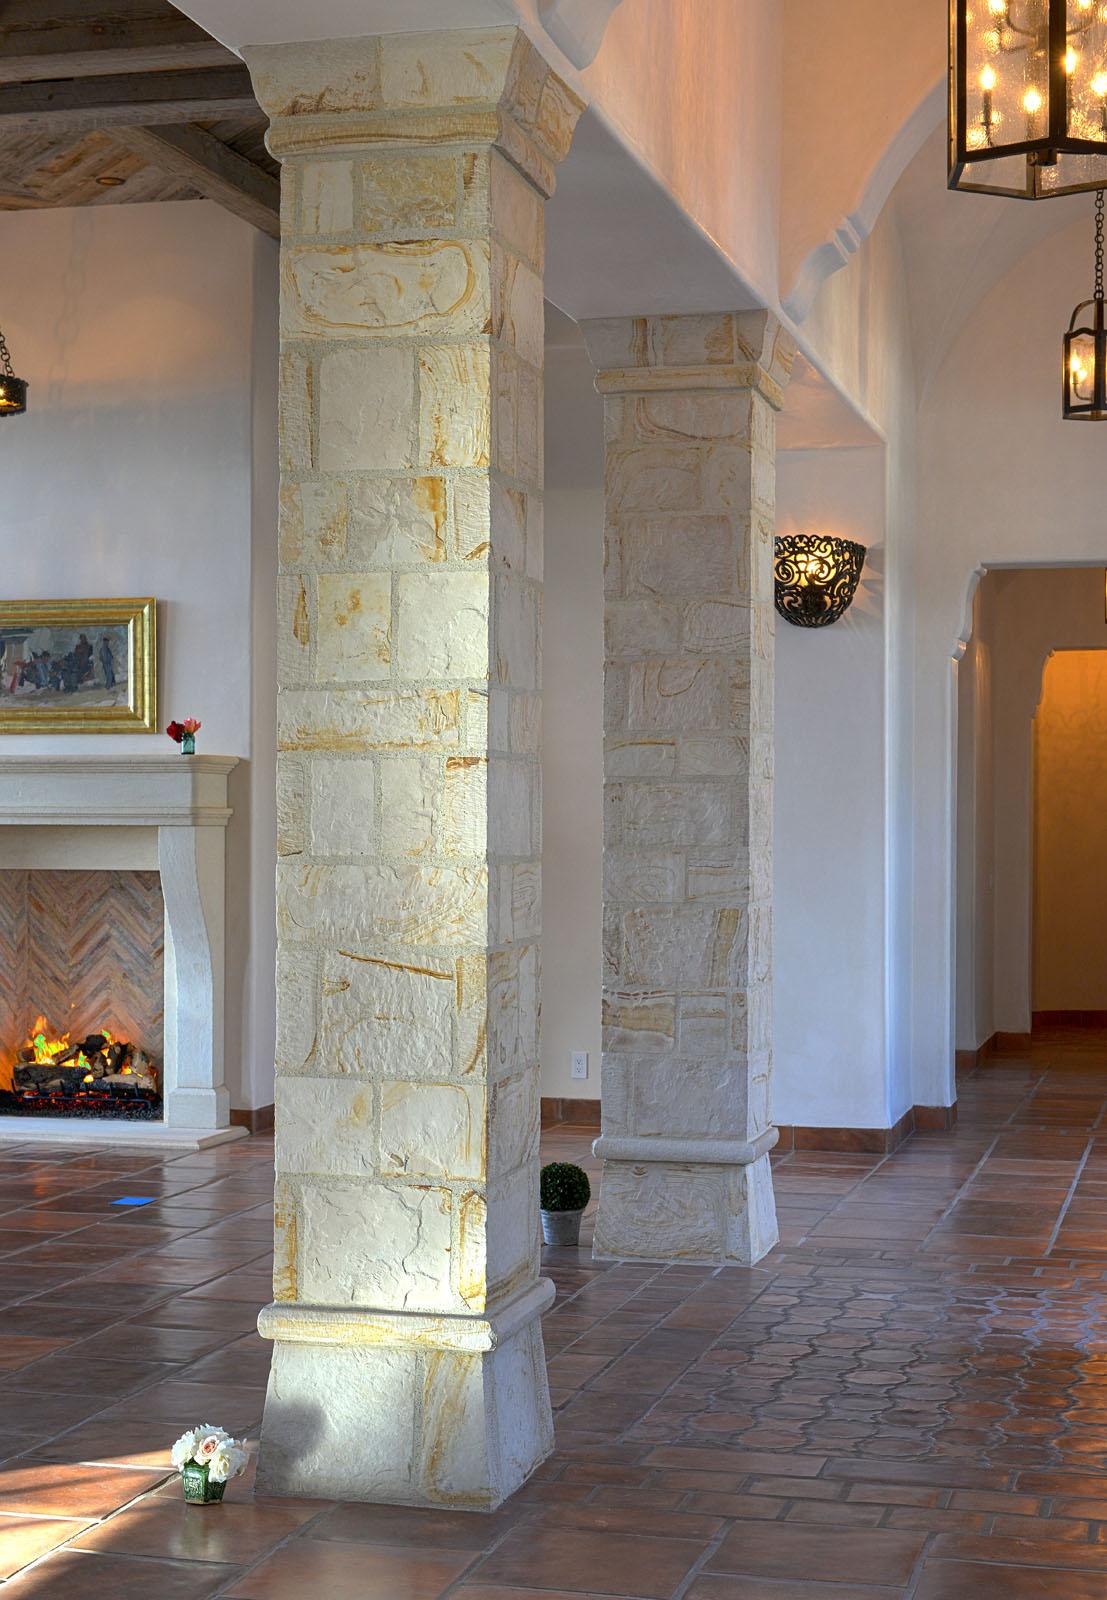 Bertelsen Residence 11 - Entry gallery stone columns and Spanish arches.jpg